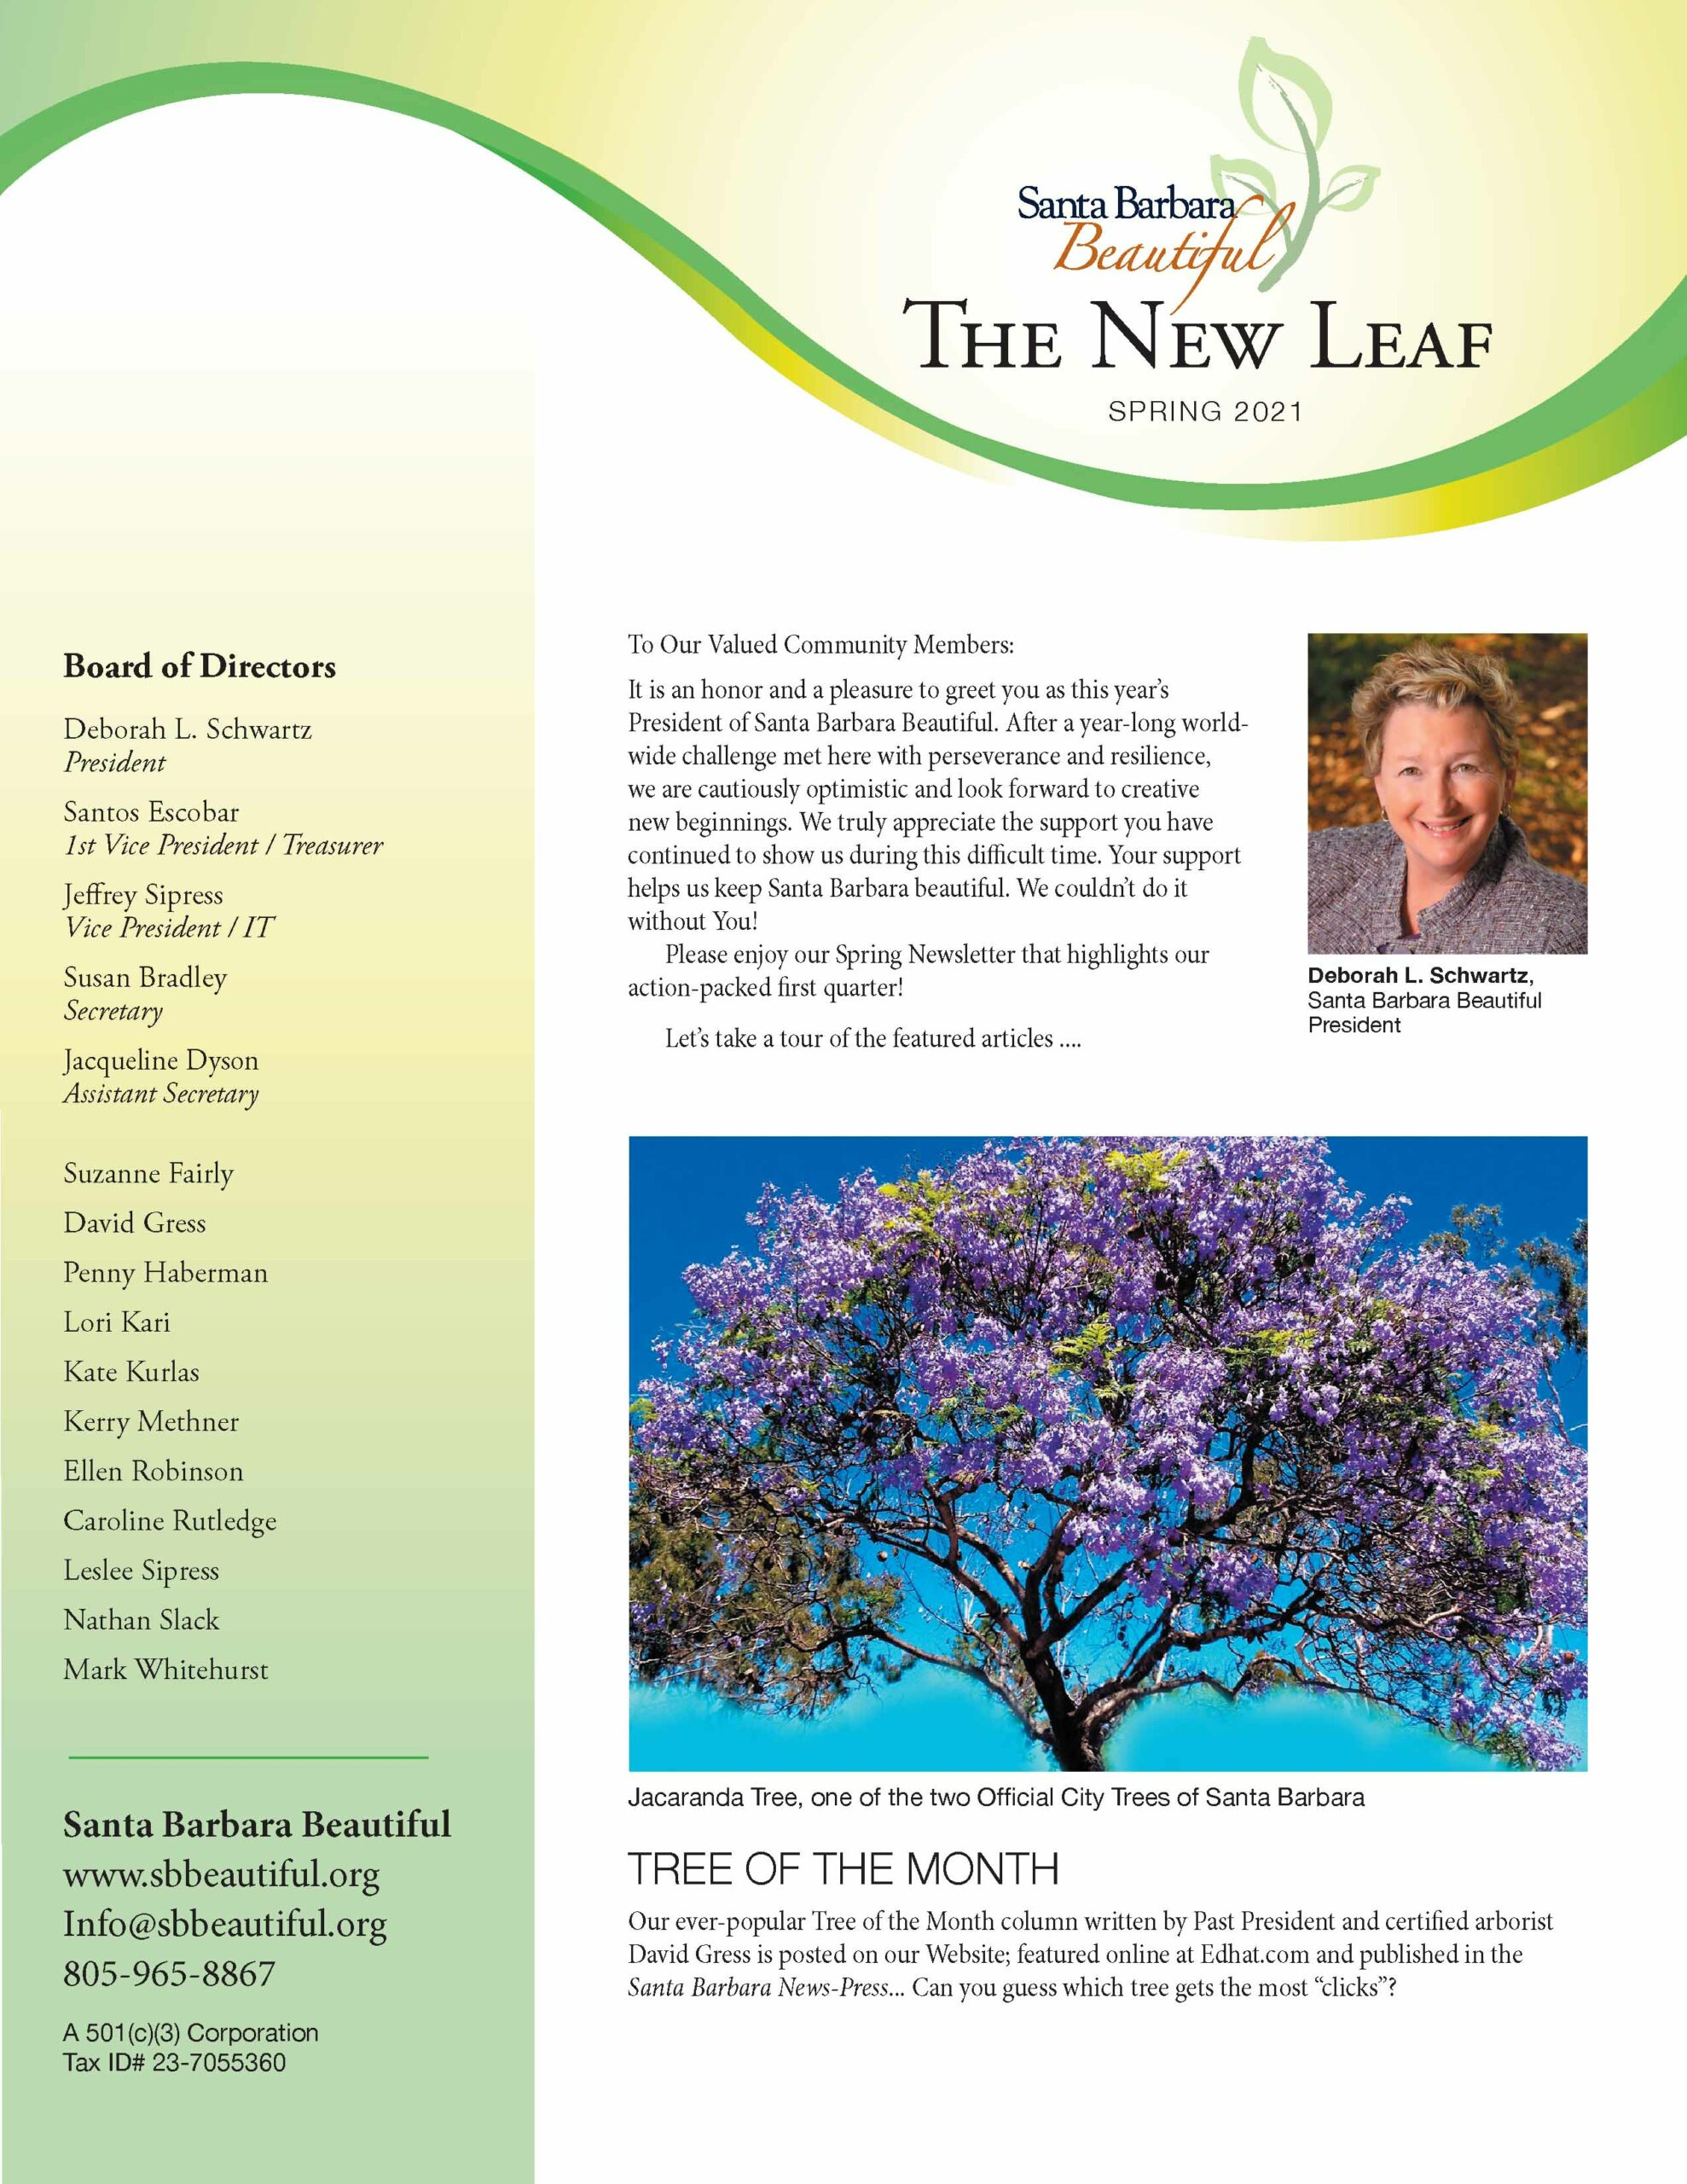 santa barbara beautiful new leaf newsletter spring 2021